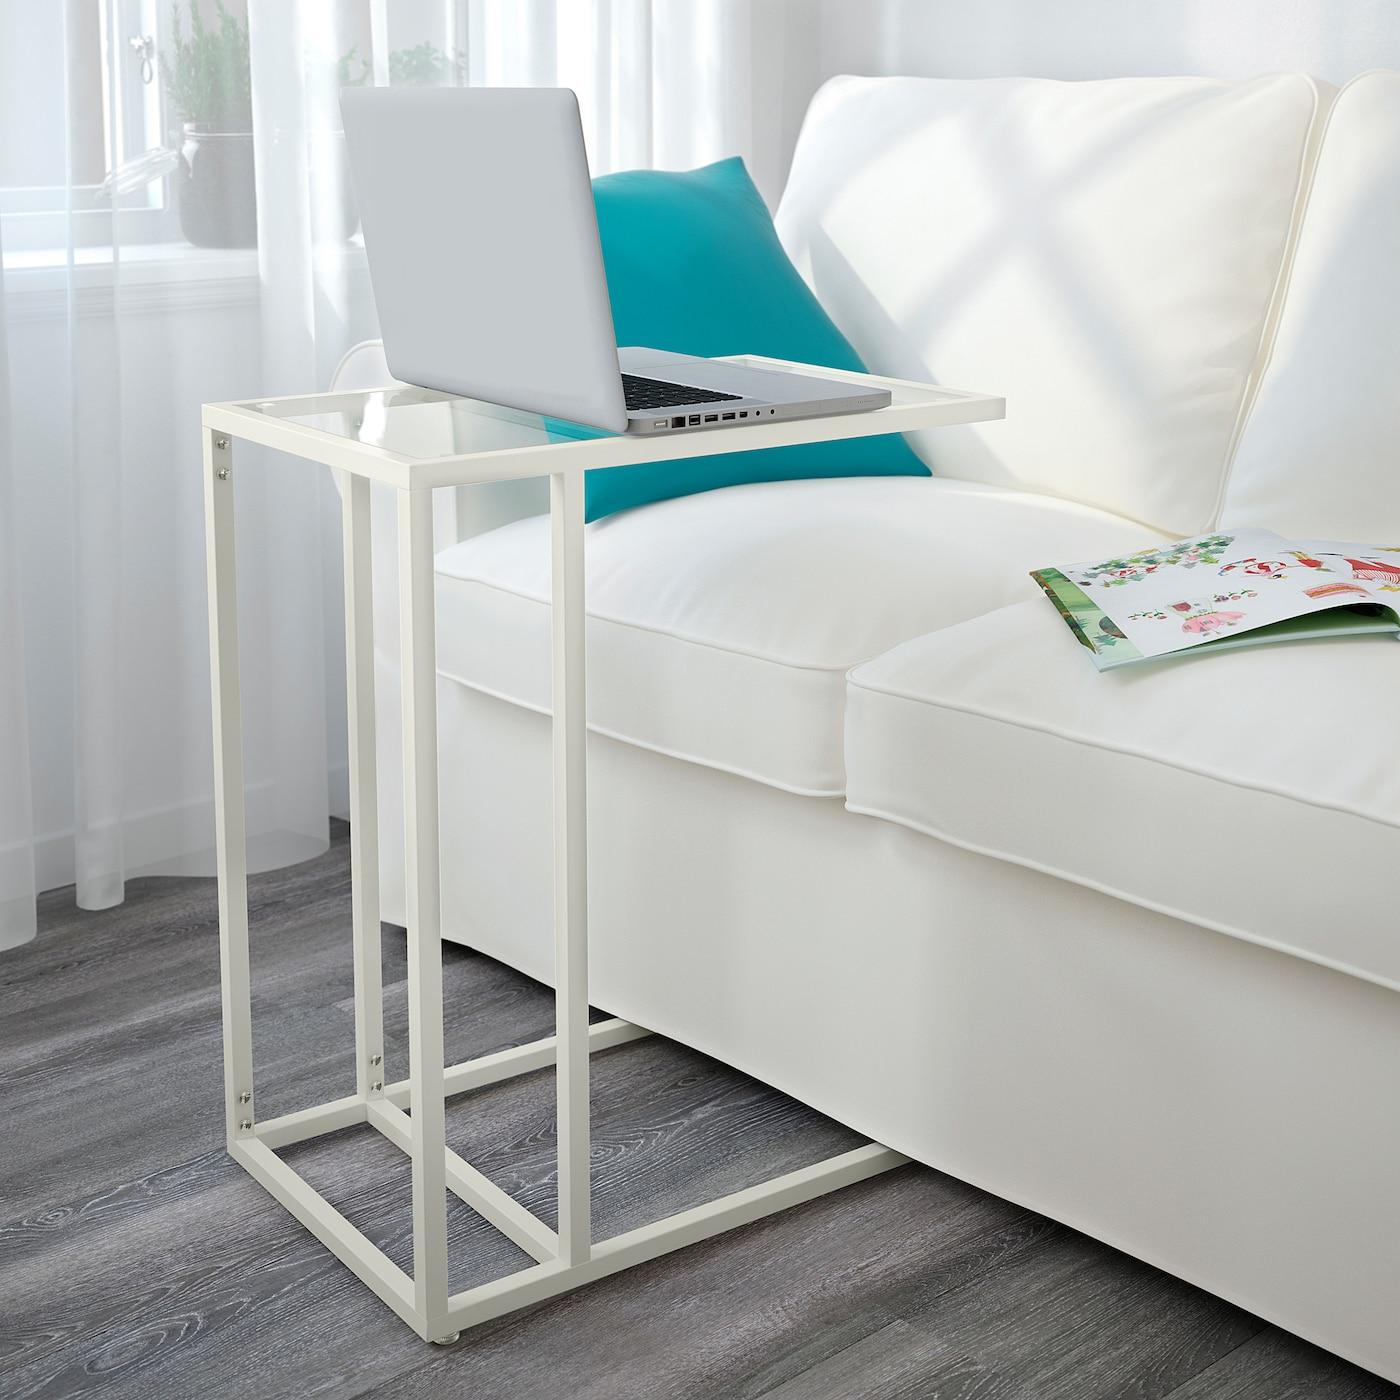 VITTSJÖ Laptopgestell weißGlas IKEA Deutschland